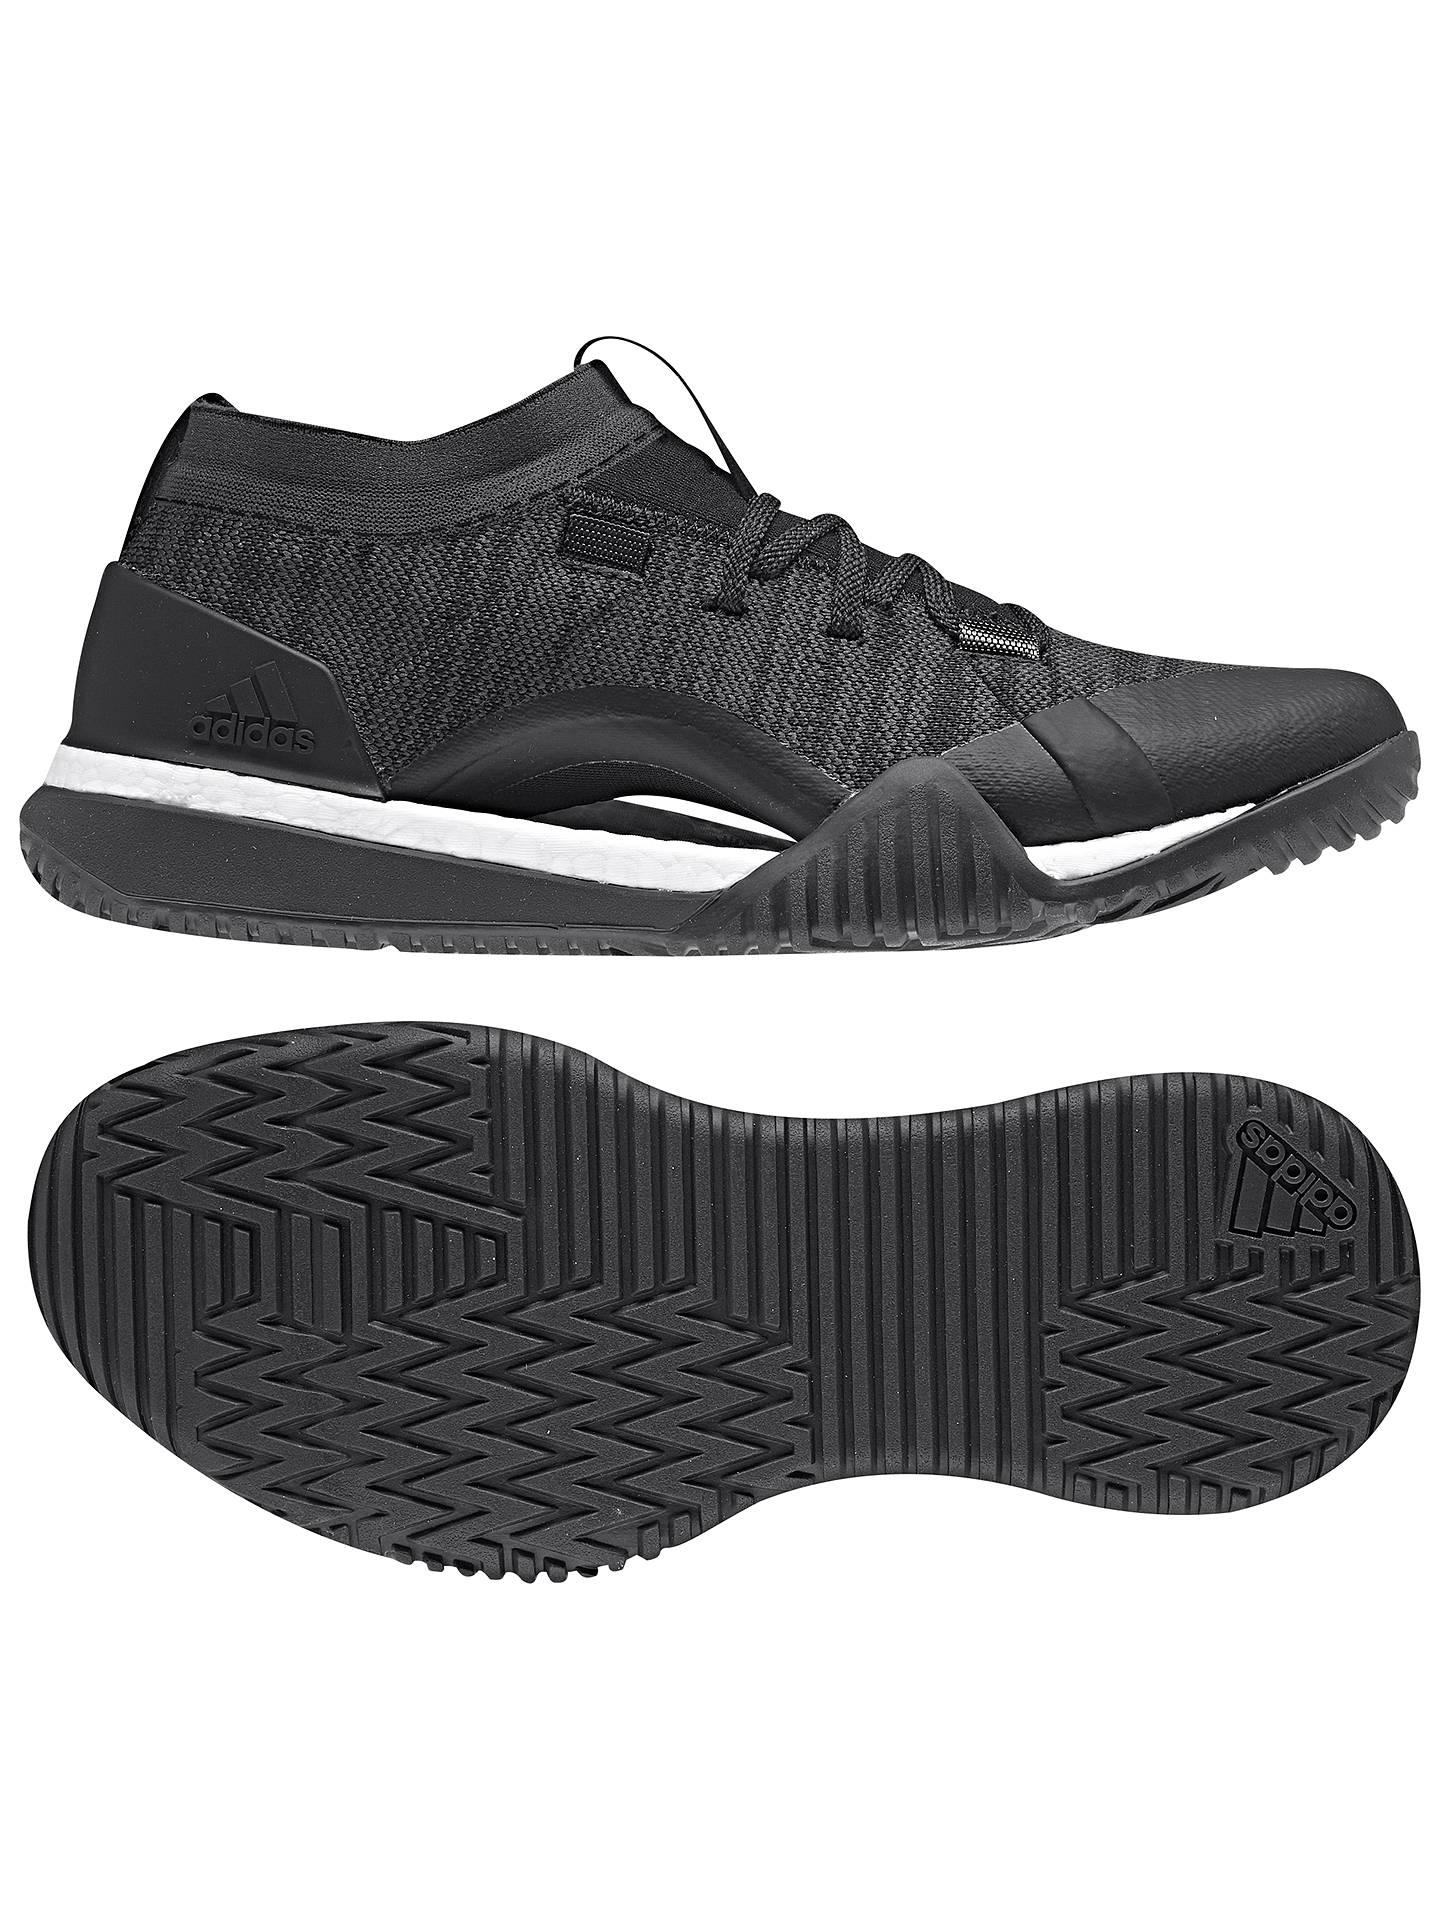 2246e1f41 Buy adidas Pure Boost X TR3 Training Shoes